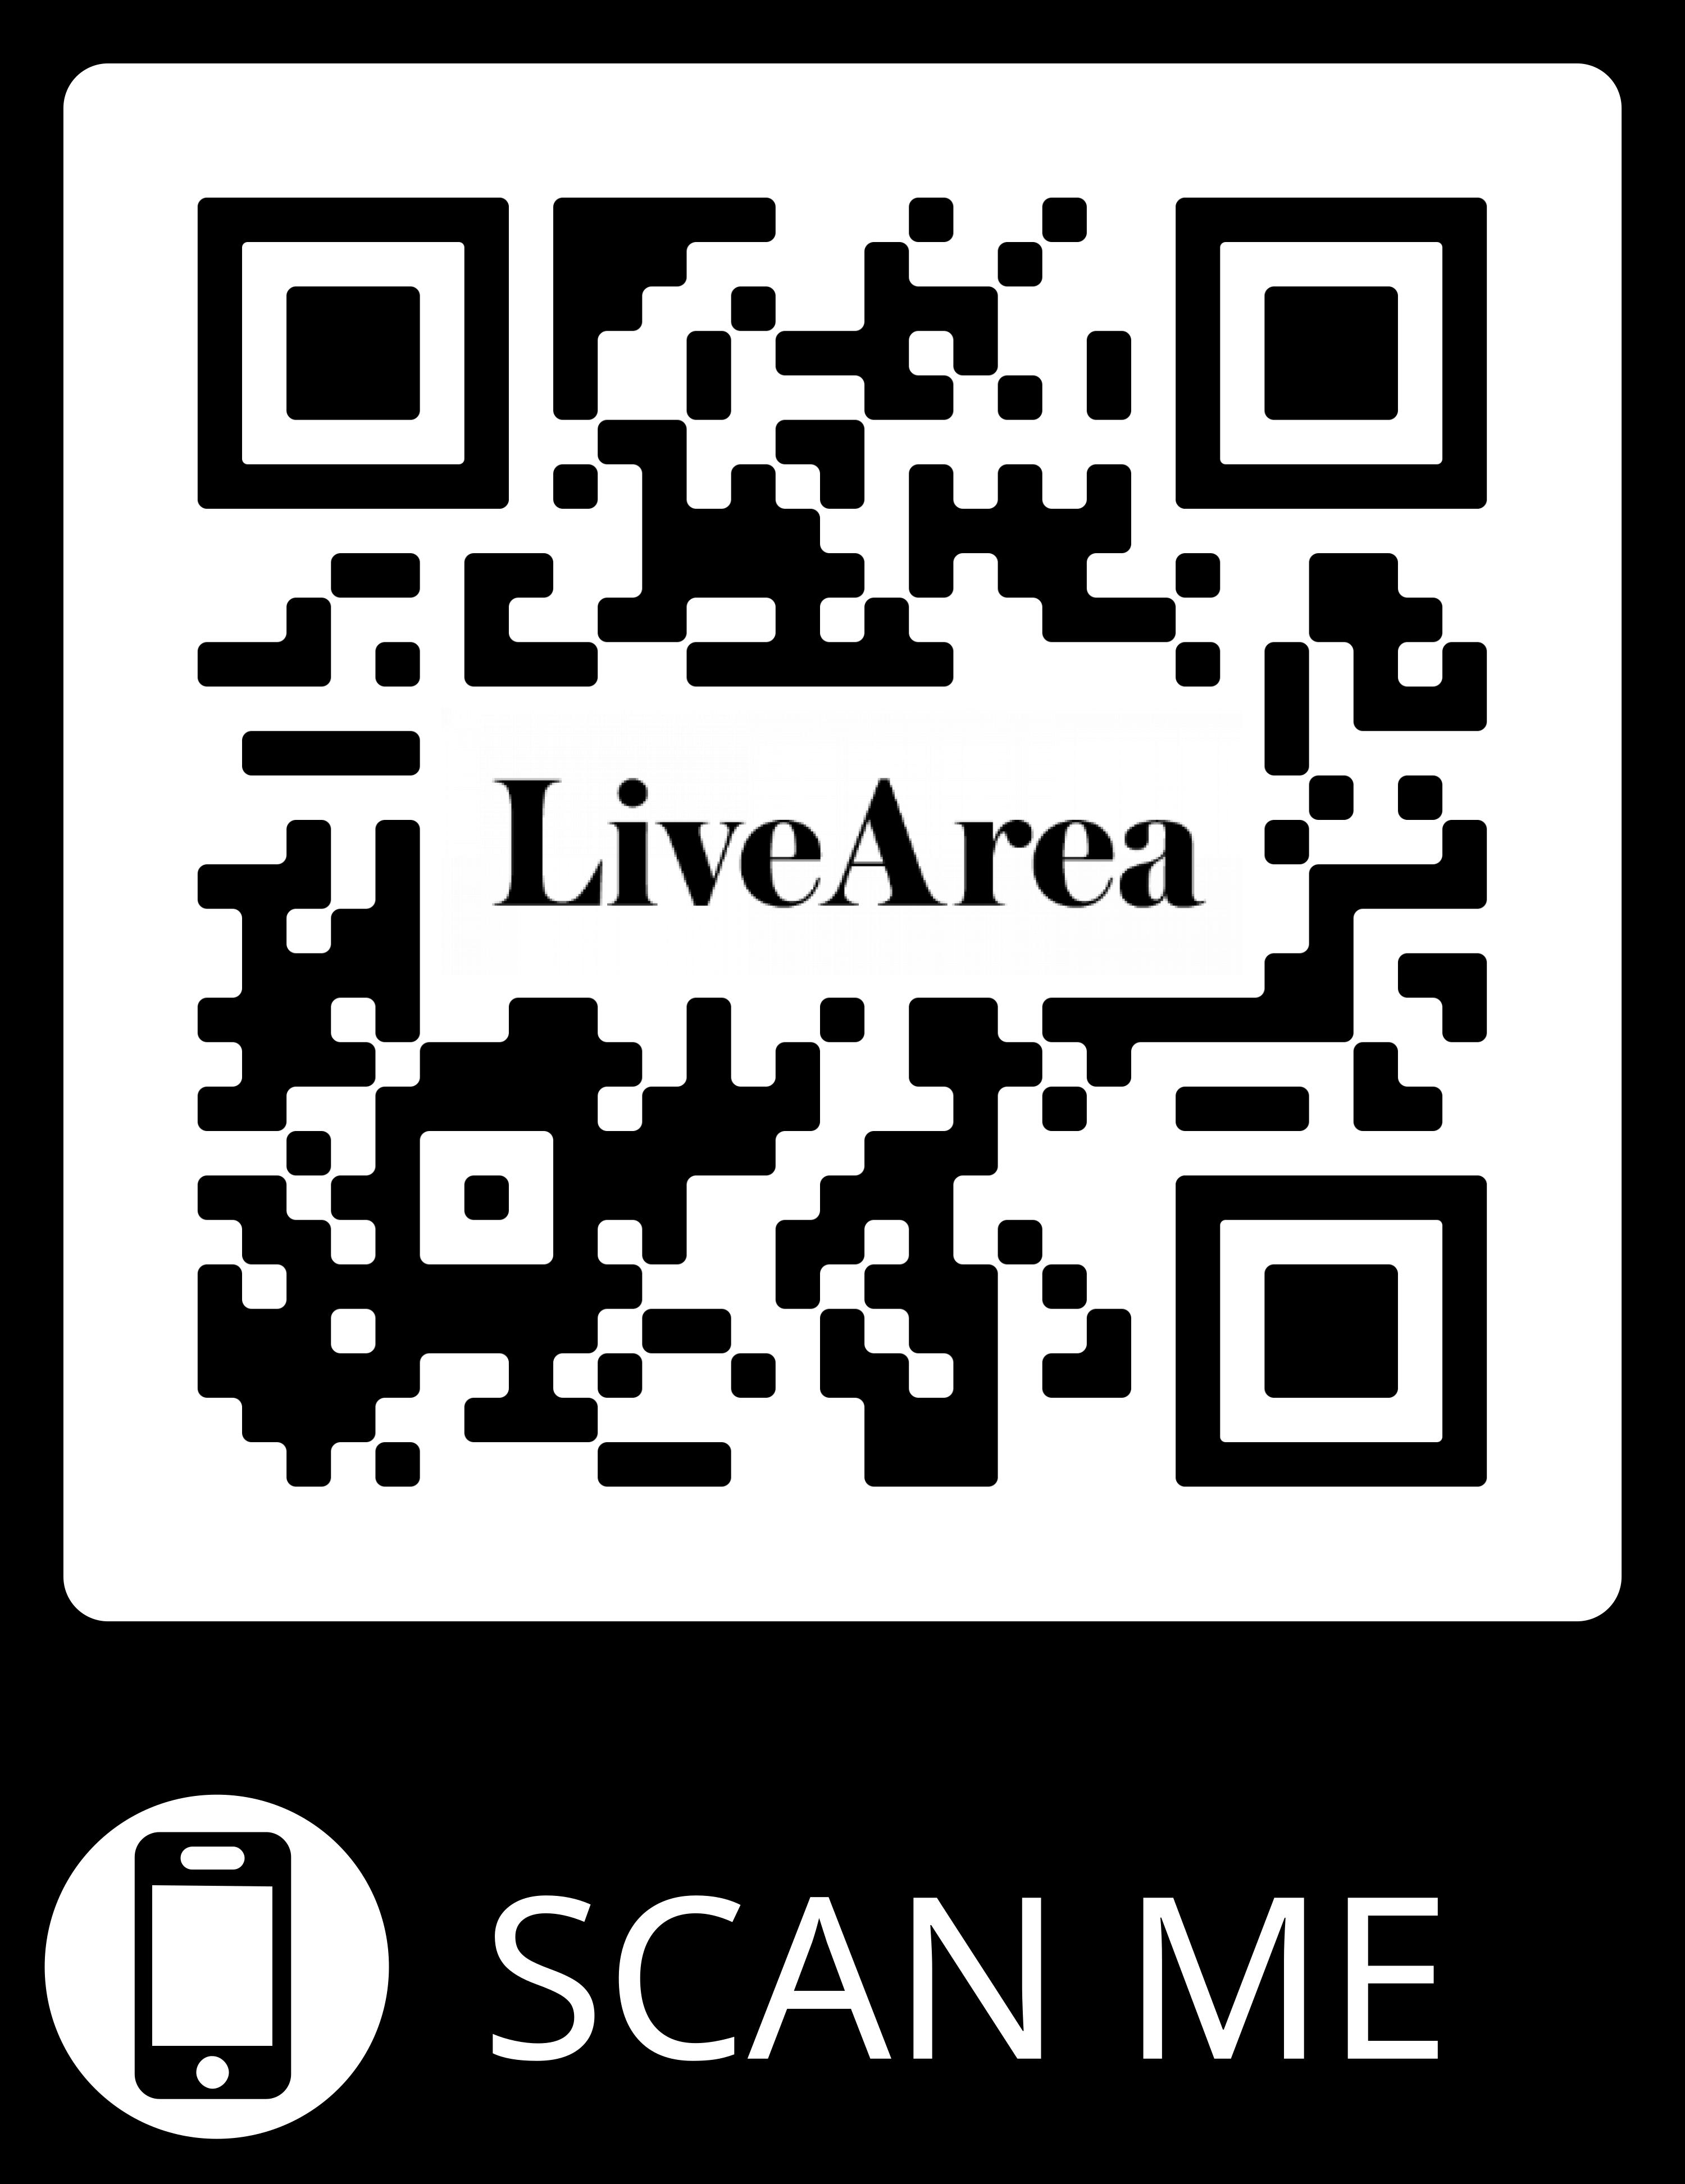 LiveArea Threekit QR Code